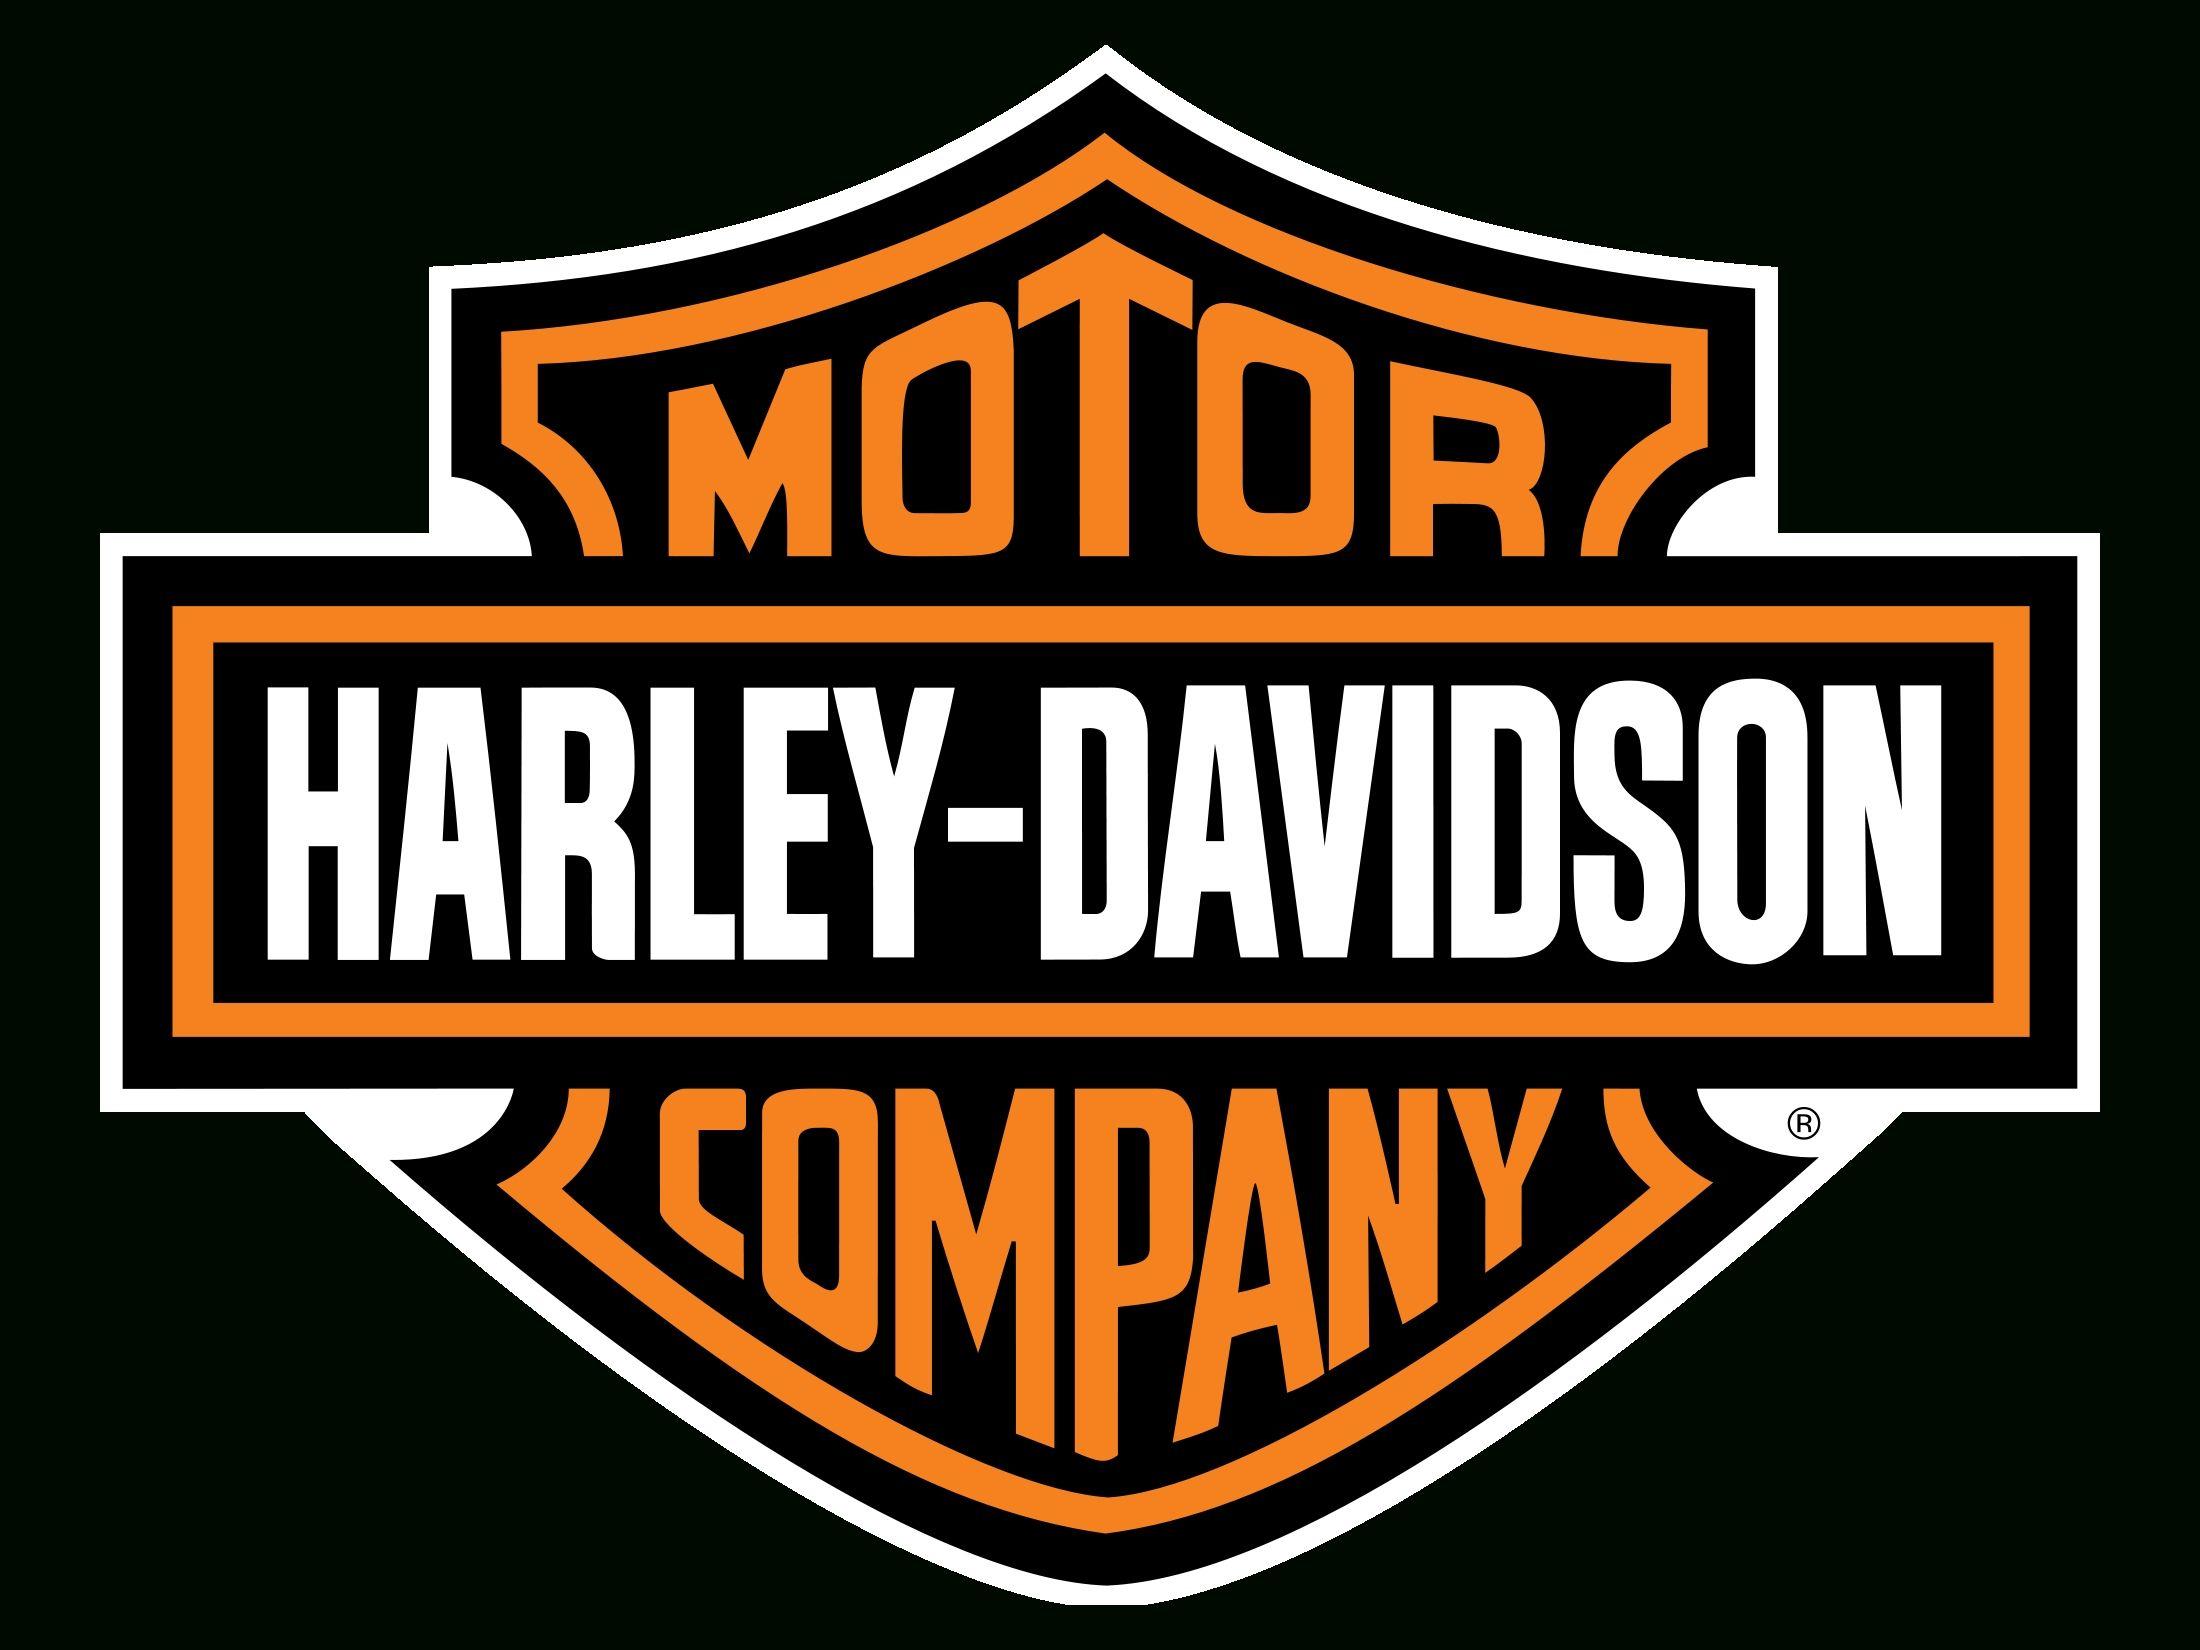 10 Most Popular Harley Davidson Logos Images Full Hd 1080p For Pc Desktop Harley Davidson Logo Harley Harley Davidson